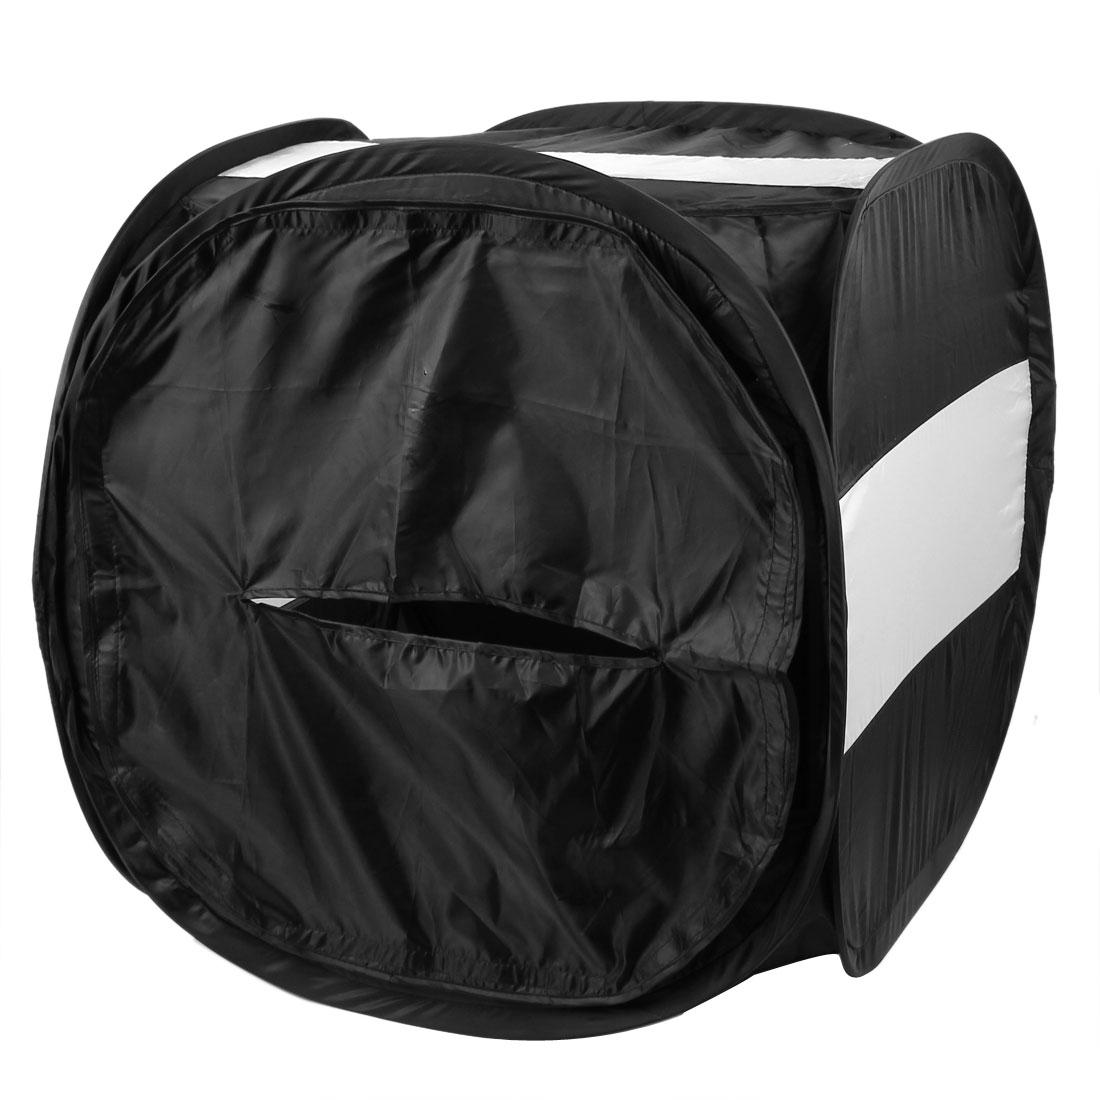 "22"" Photography Studio Shooting Tent Light Softbox Diffuser Soft Box"